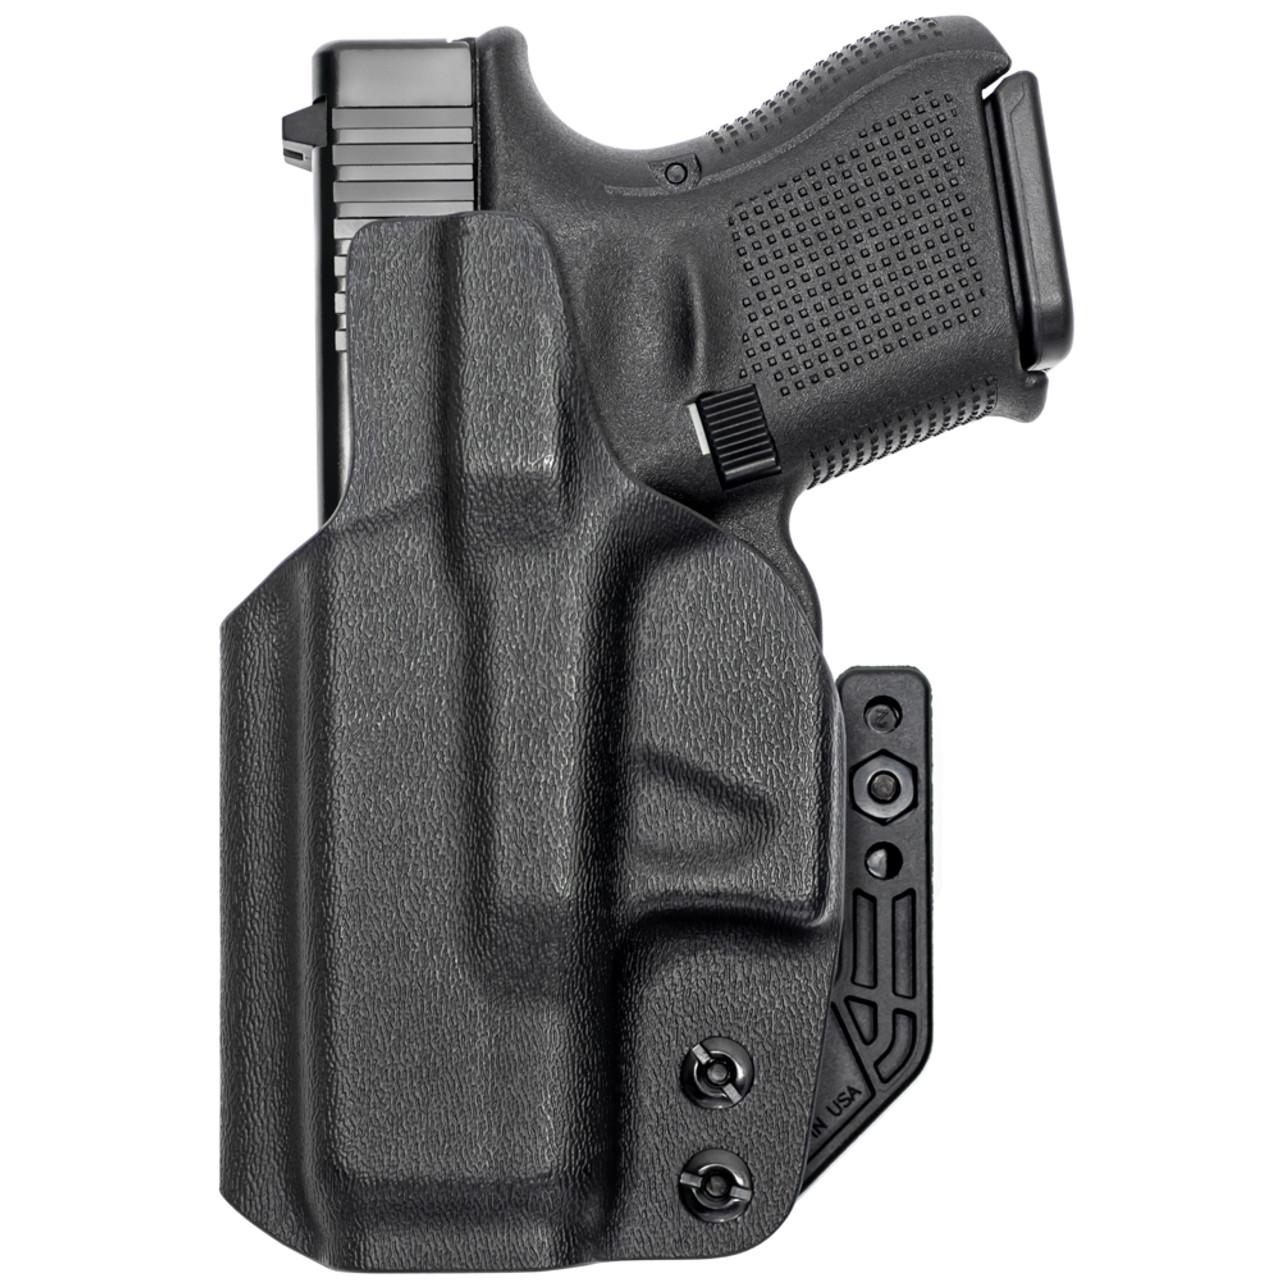 Glock 26/27/28/33 - OATH IWB Holster